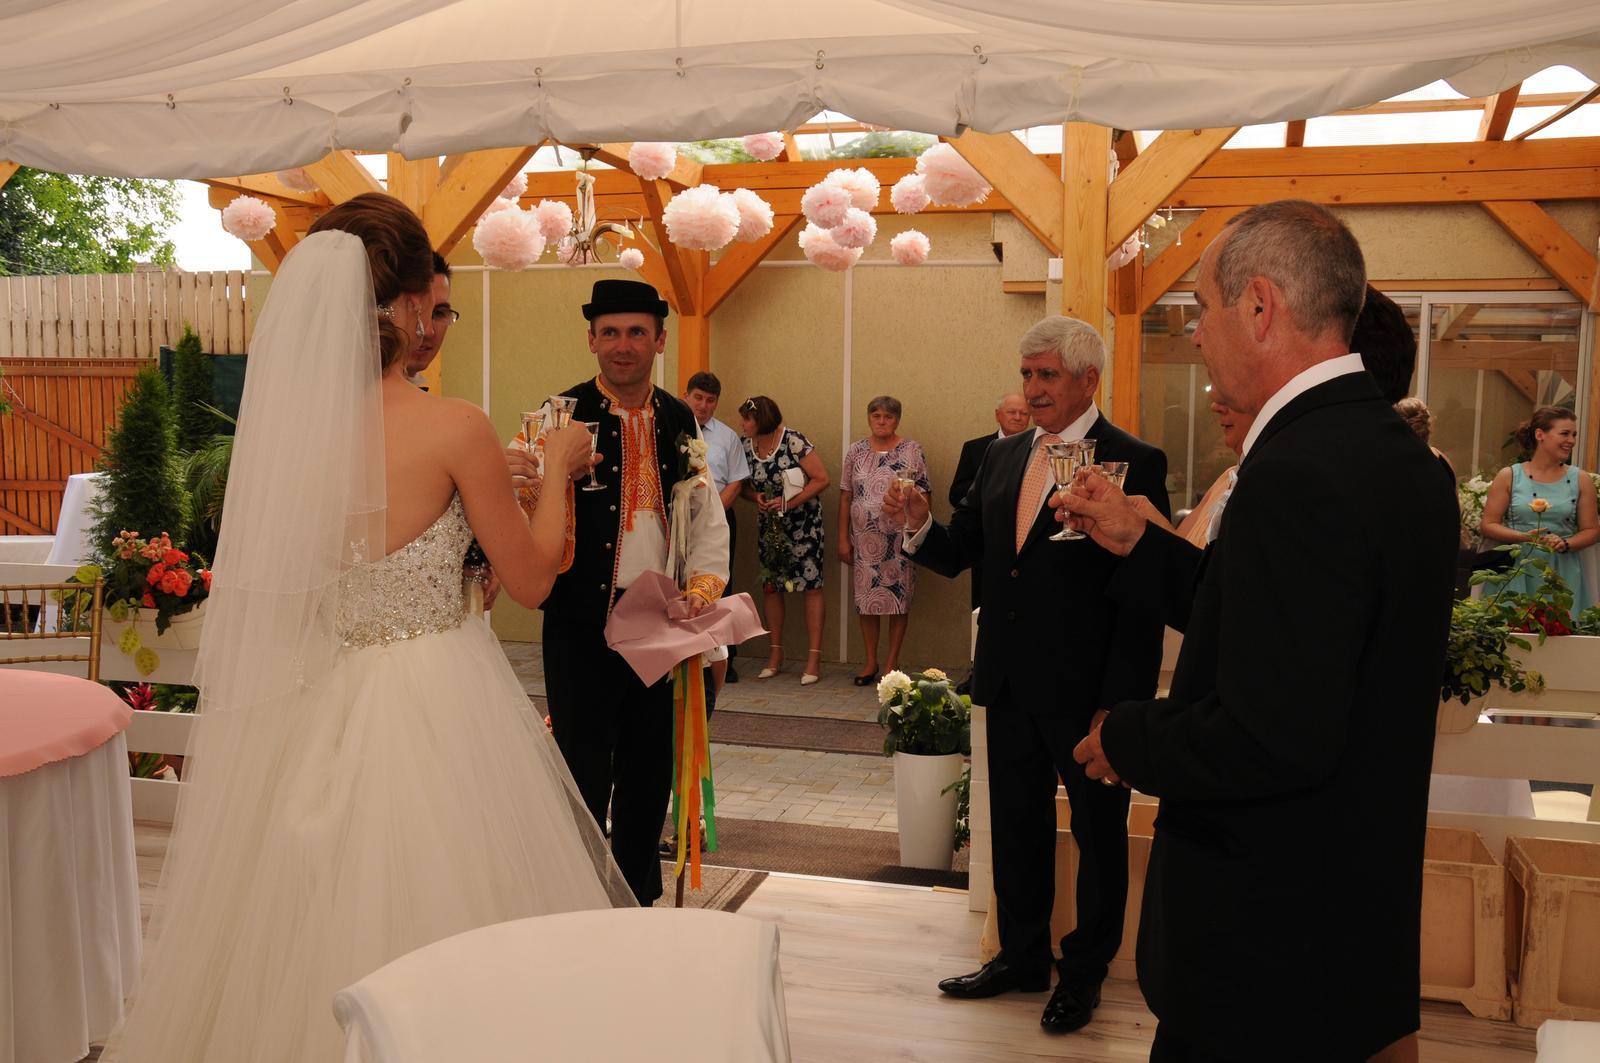 Svadba Pohranice - Obrázok č. 3